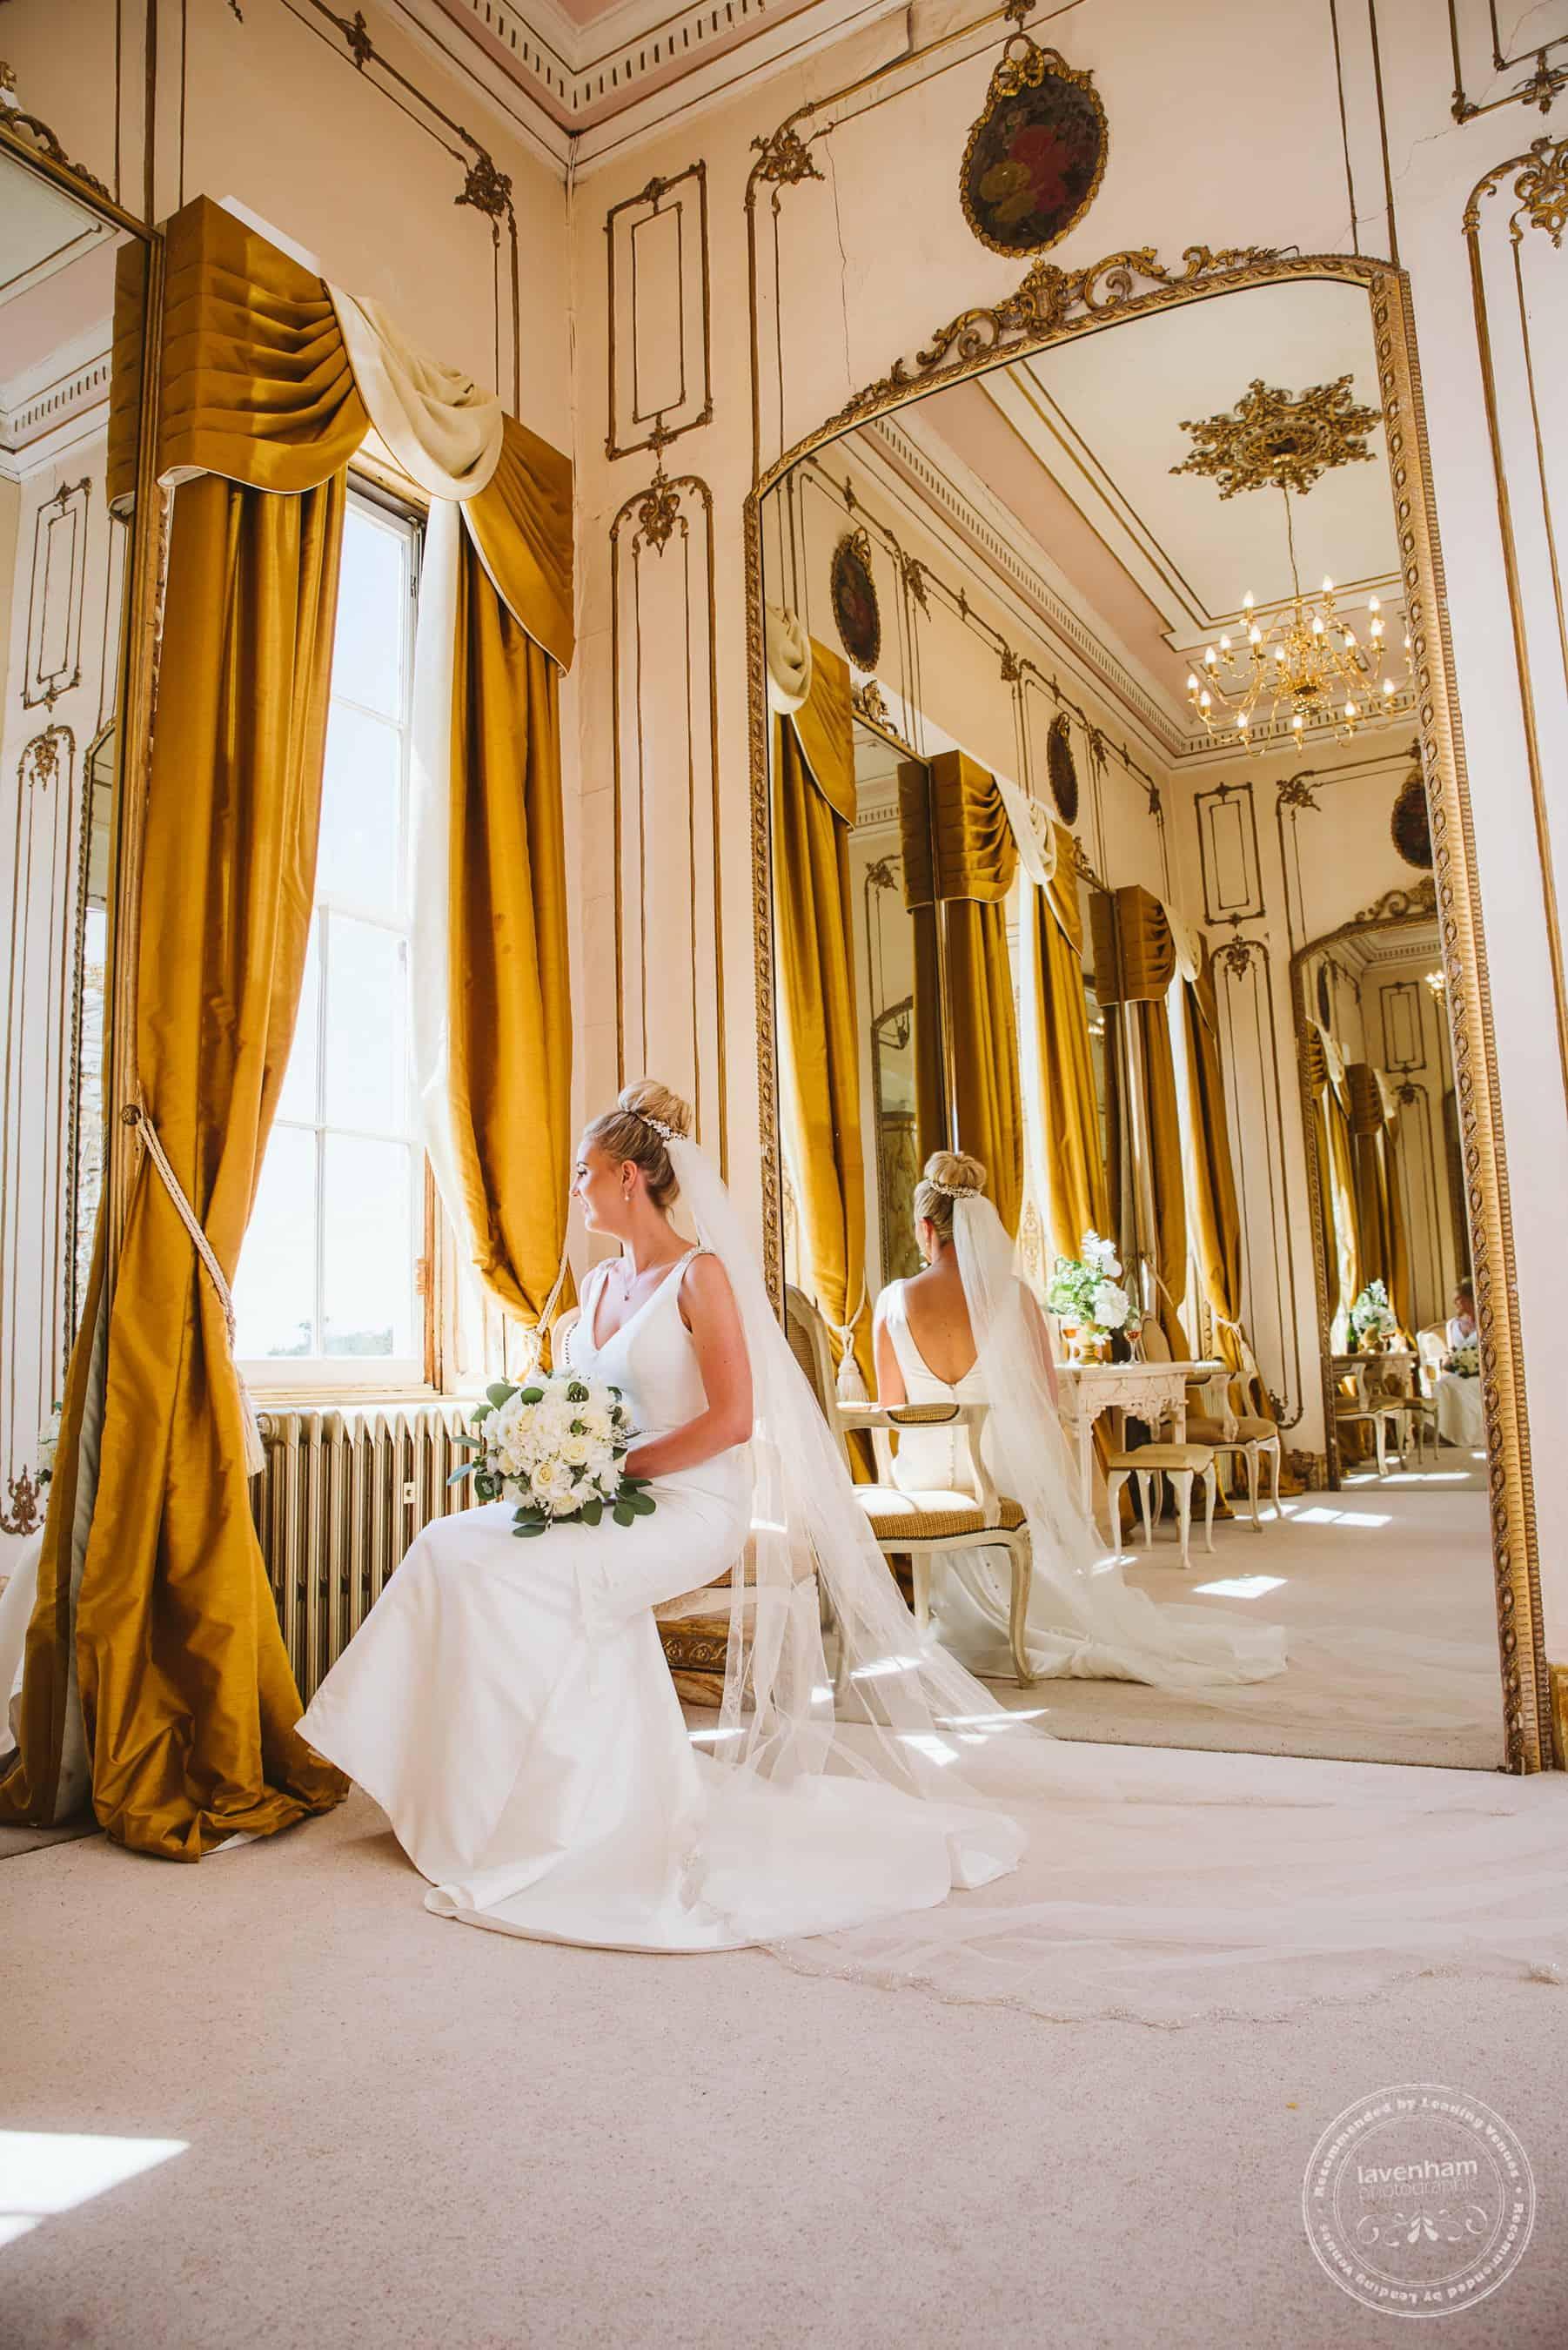 220618 Gosfield Hall Wedding Photography Lavenham Photographic 0050